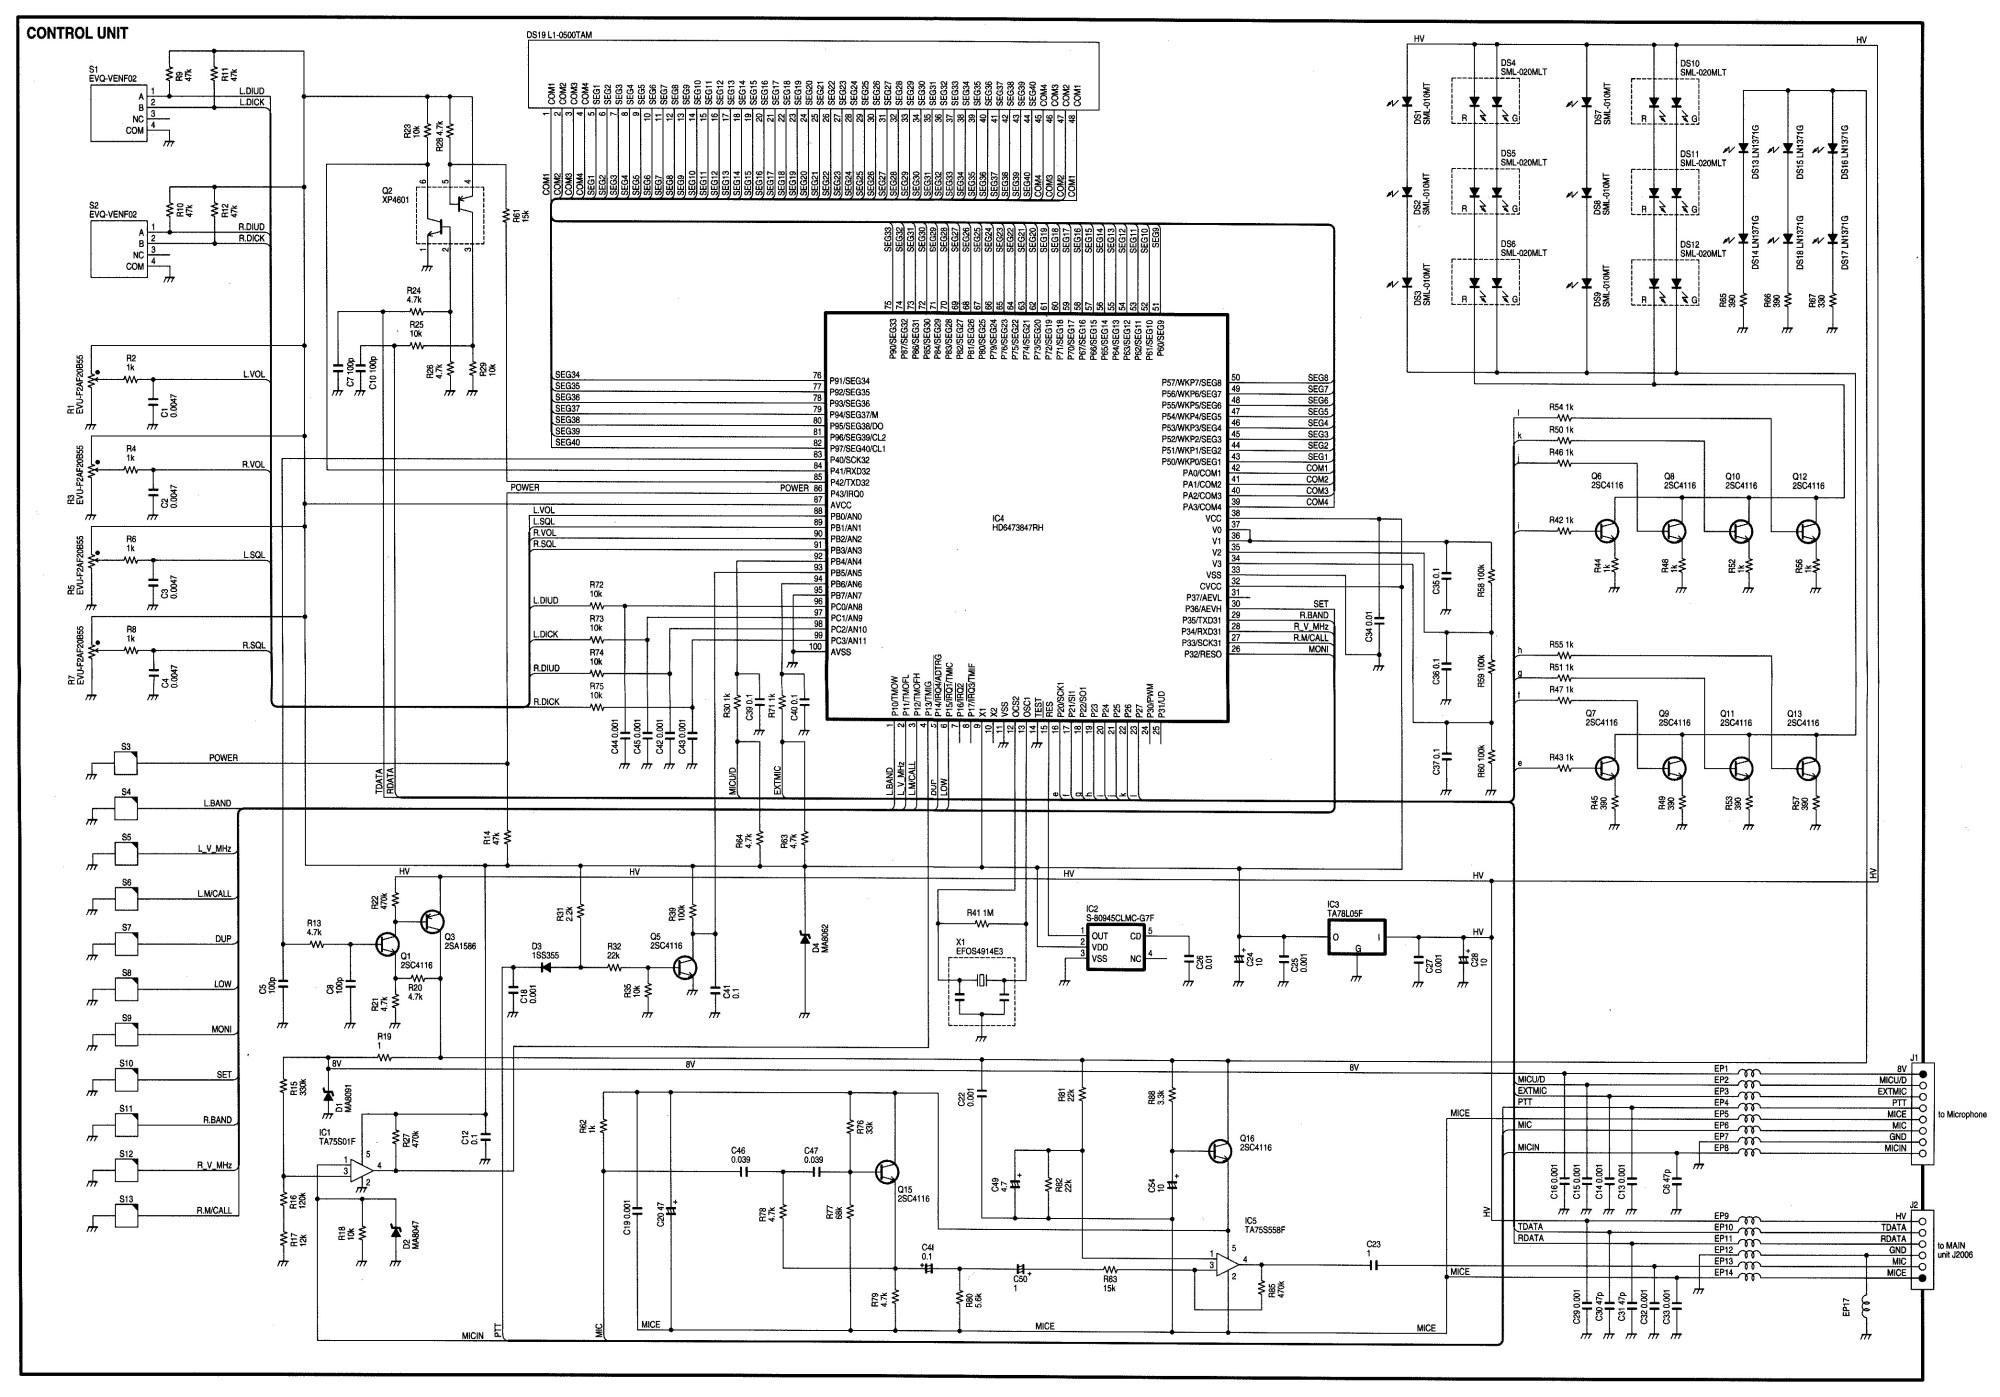 hight resolution of u0026gt circuits u0026gt radio control circuits pdf l21943